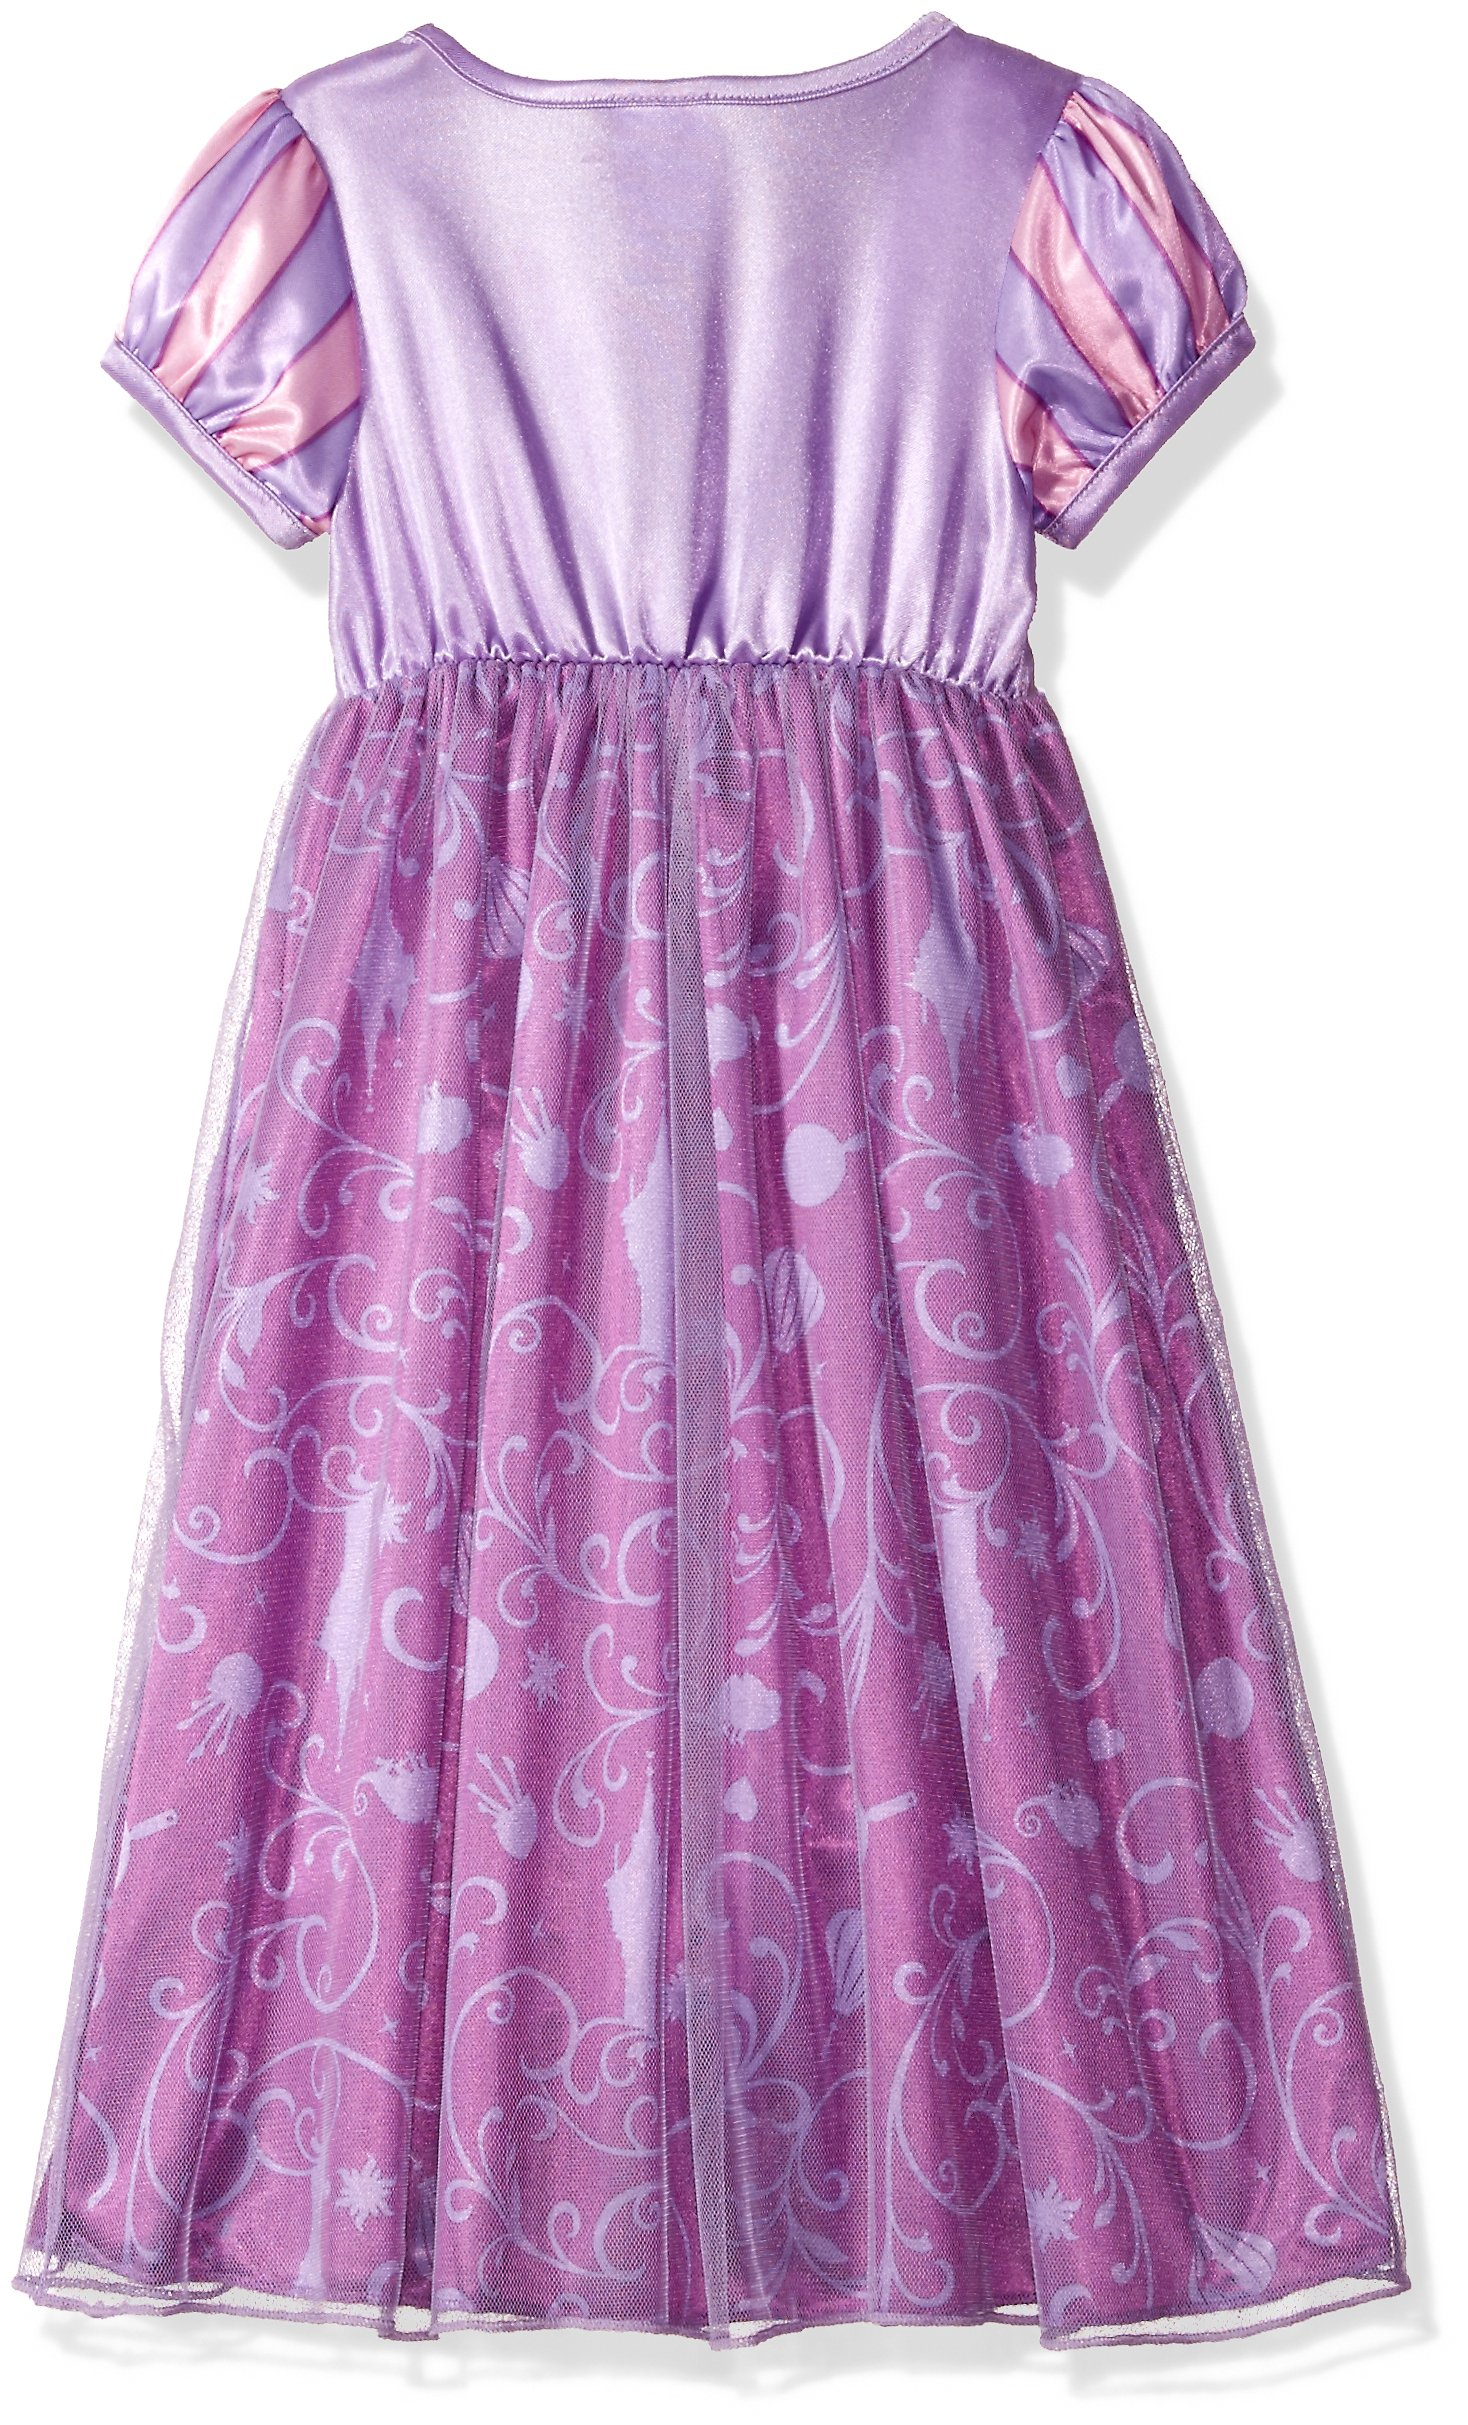 Disney Big Girls' Fantasy Nightgowns, Rapunzel Lively Lavender, 8 by Disney (Image #2)